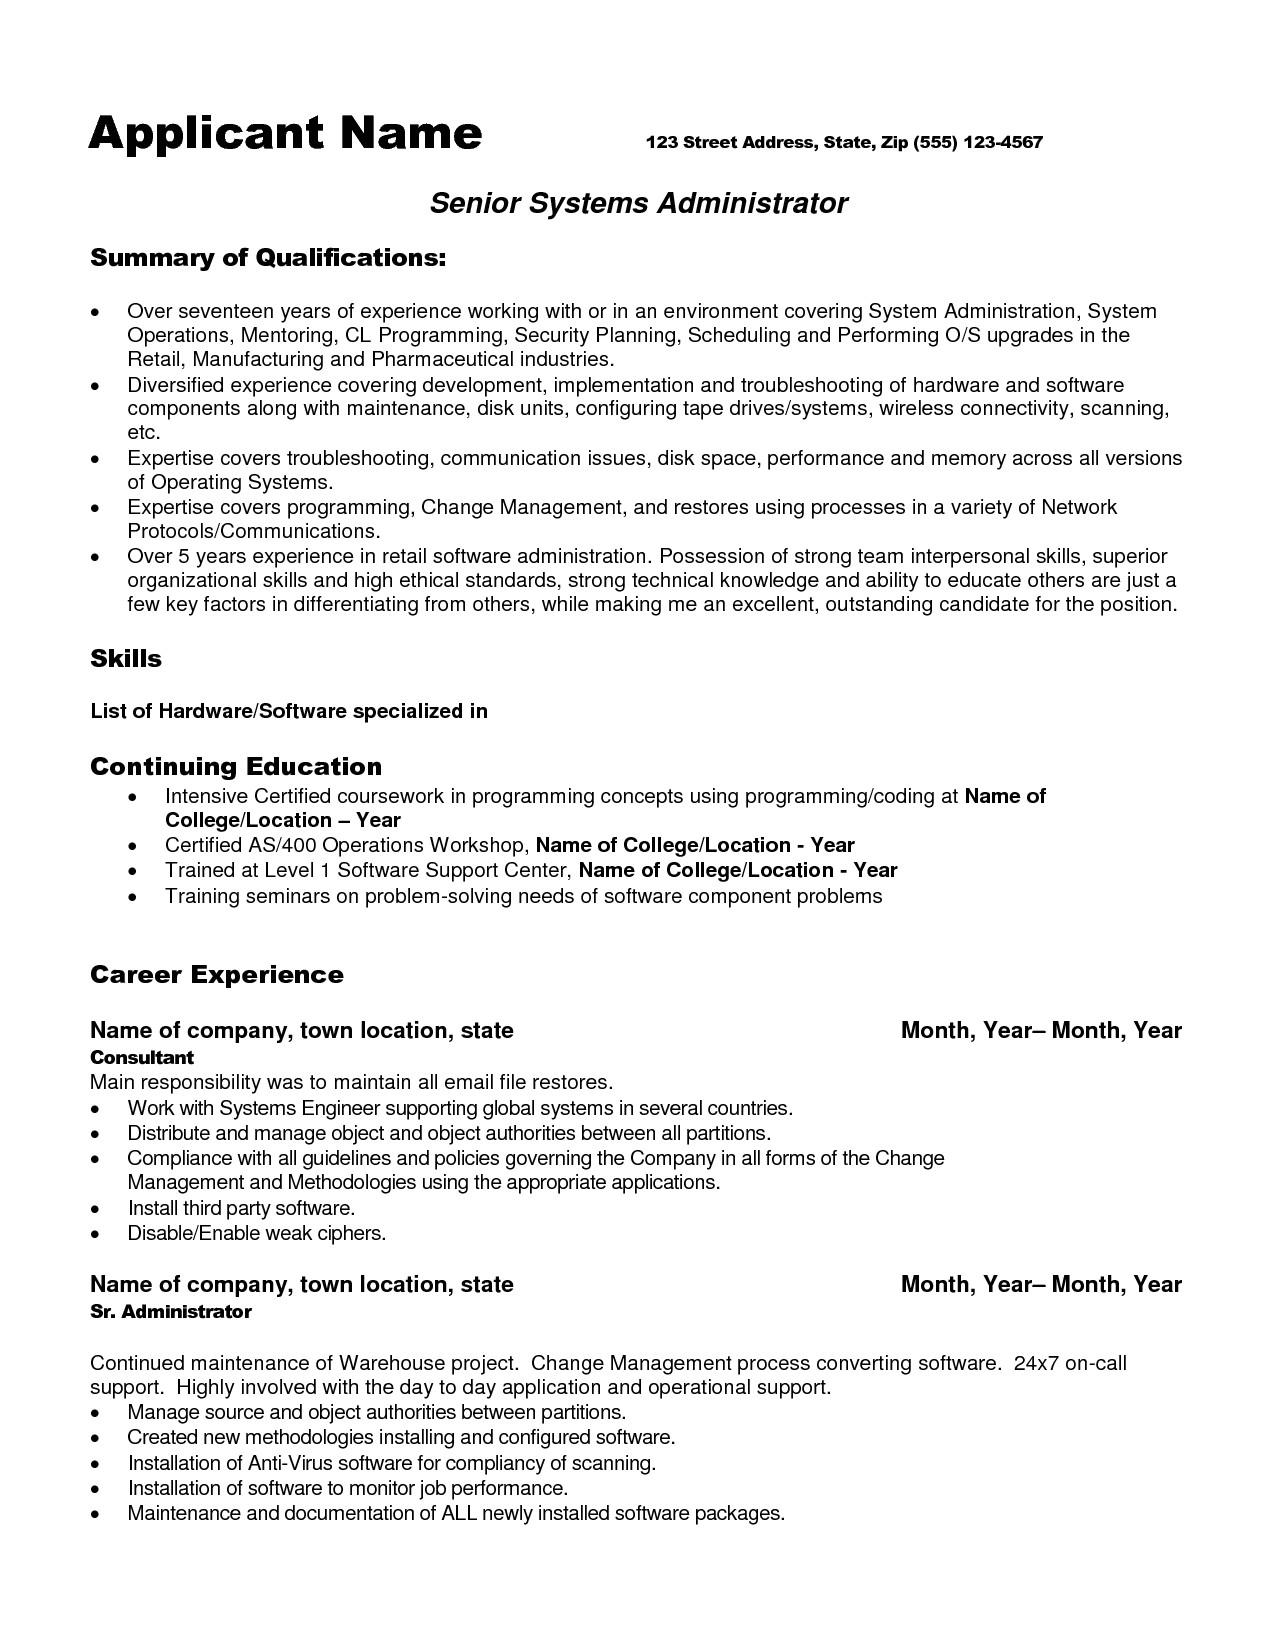 system administrator resume format for fresher